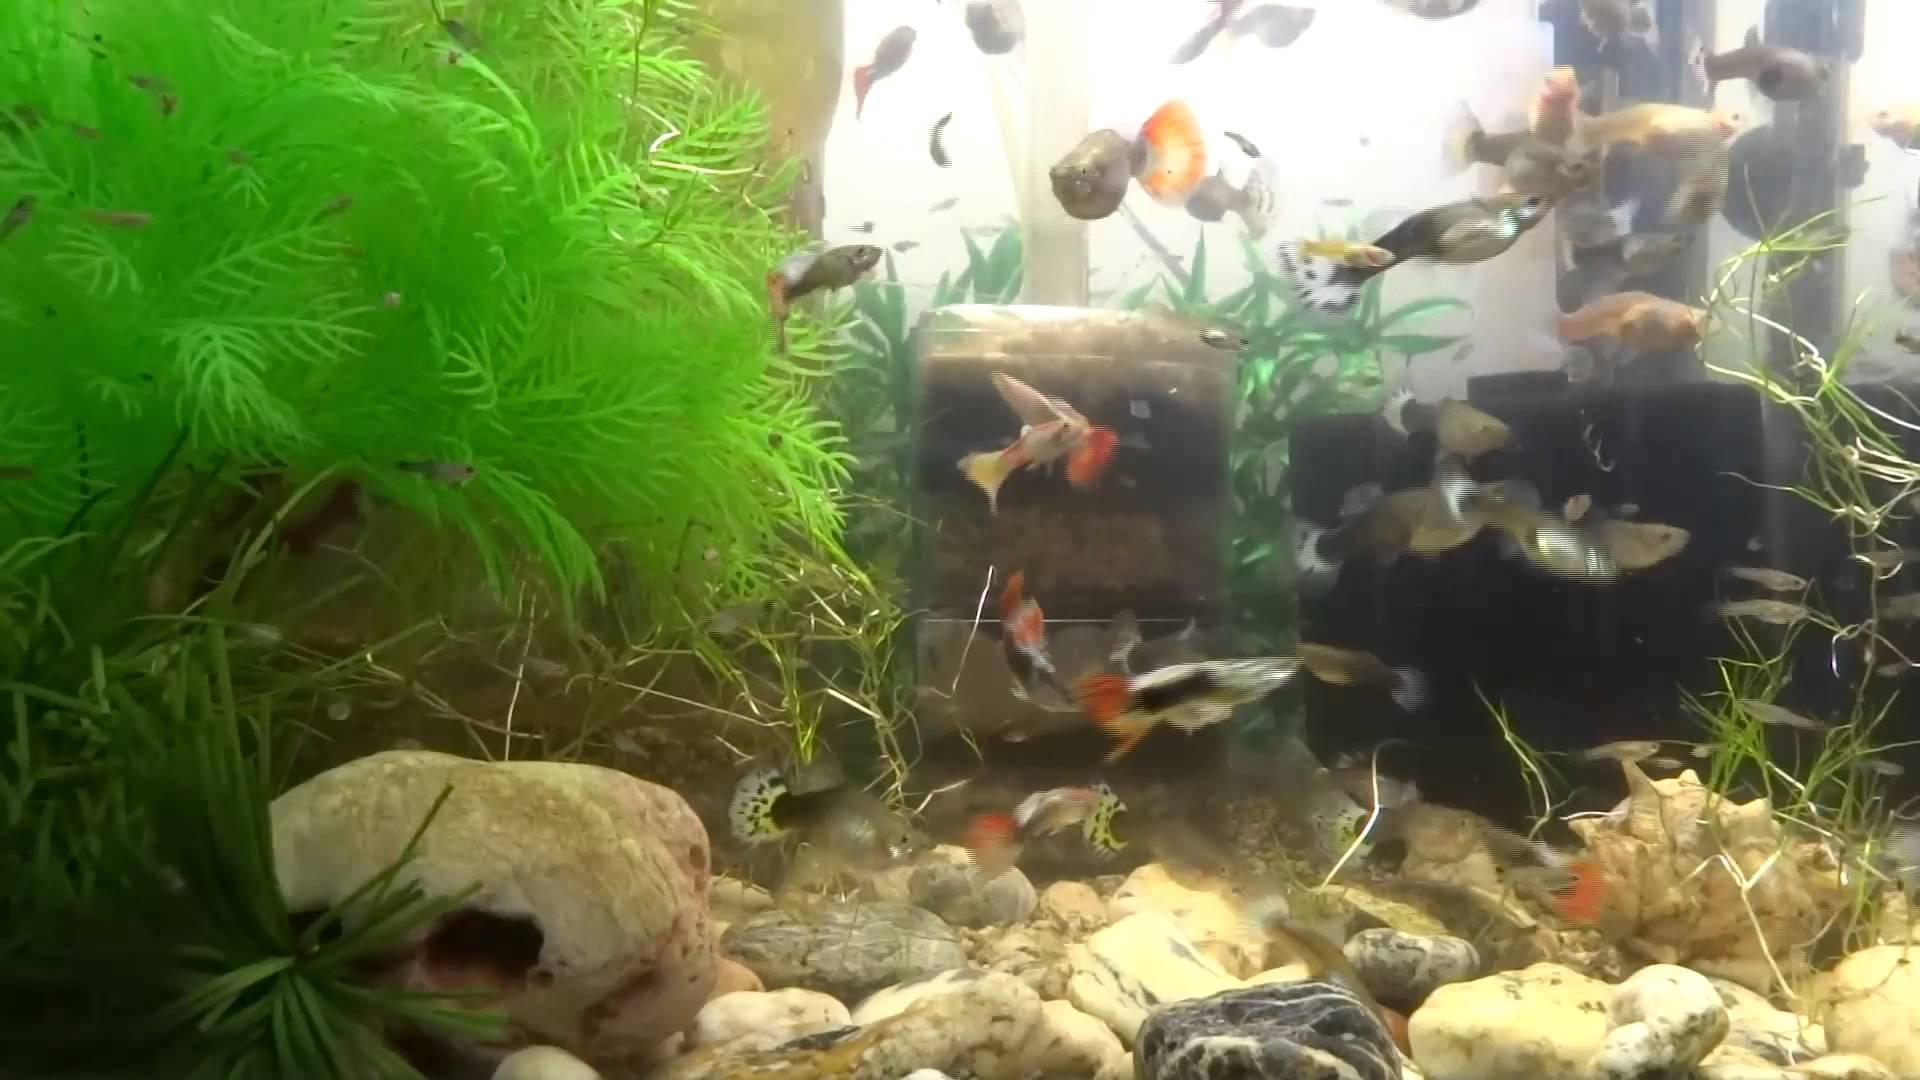 Beautiful-Fish-Aquarium-fishtank-fish-tank-howto-make-design-aquarium-FHD-1080P-NEW-wallpaper-wp3603108